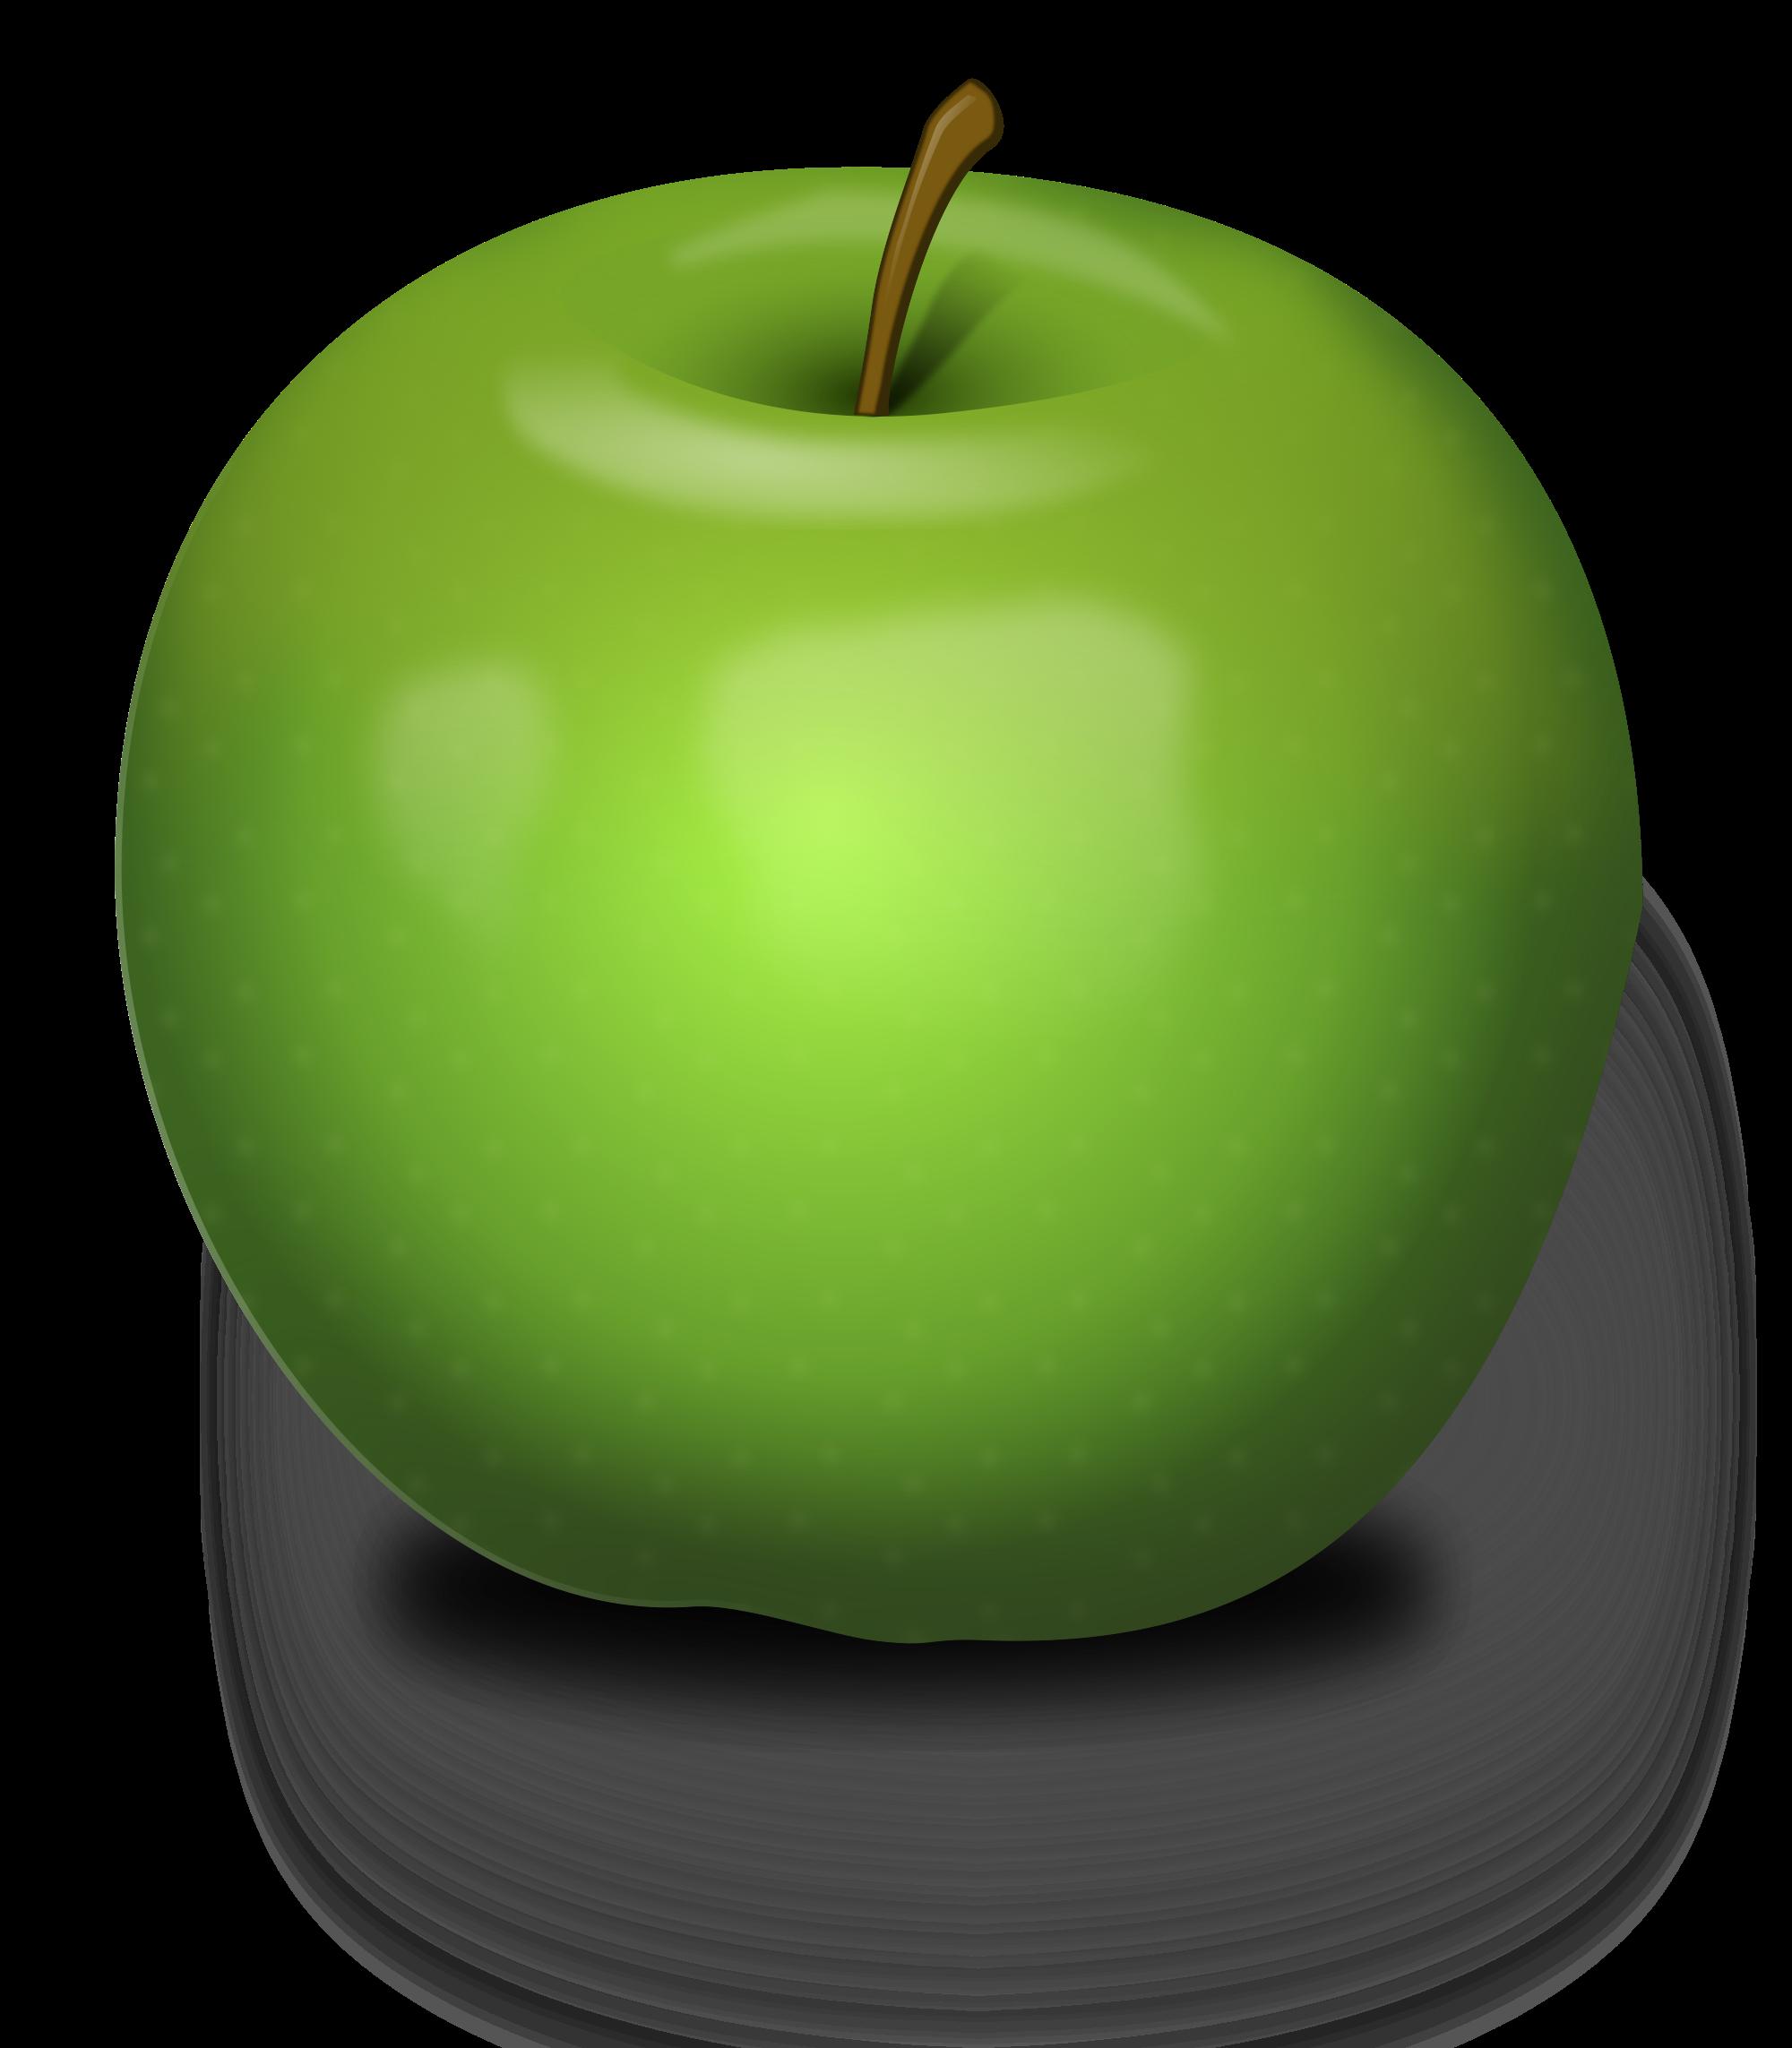 Green Apple Png Image Green Apple Apple Clip Art Apple